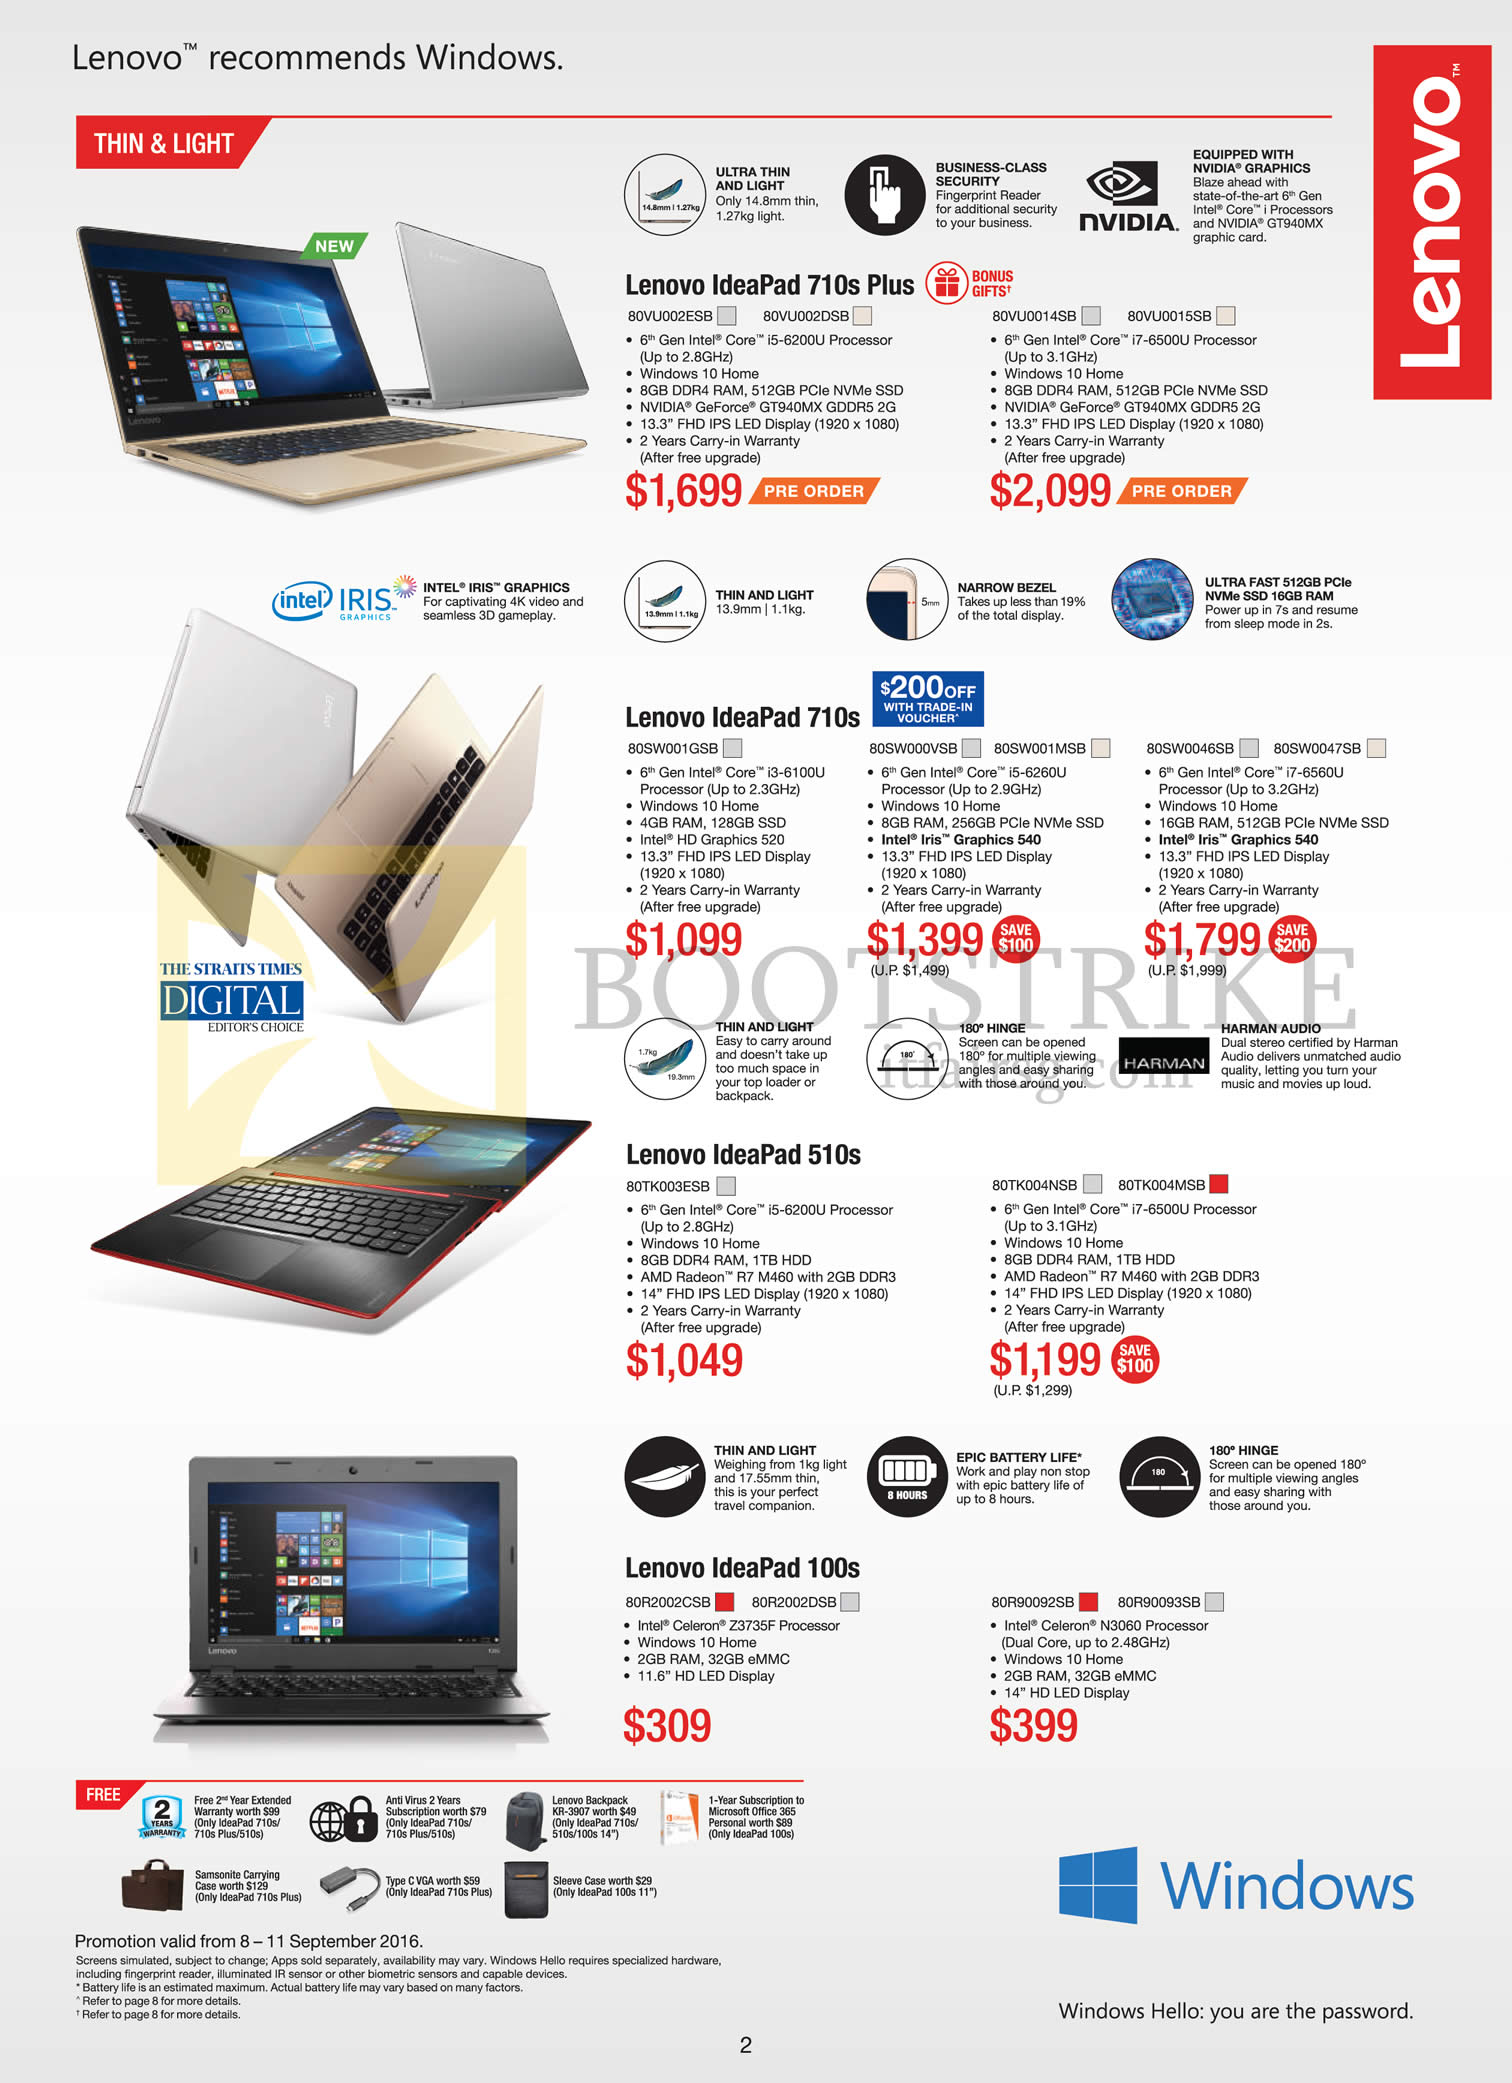 COMEX 2016 price list image brochure of Lenovo Notebooks IdeaPad 710s Plus, 710s, 510s, 100s